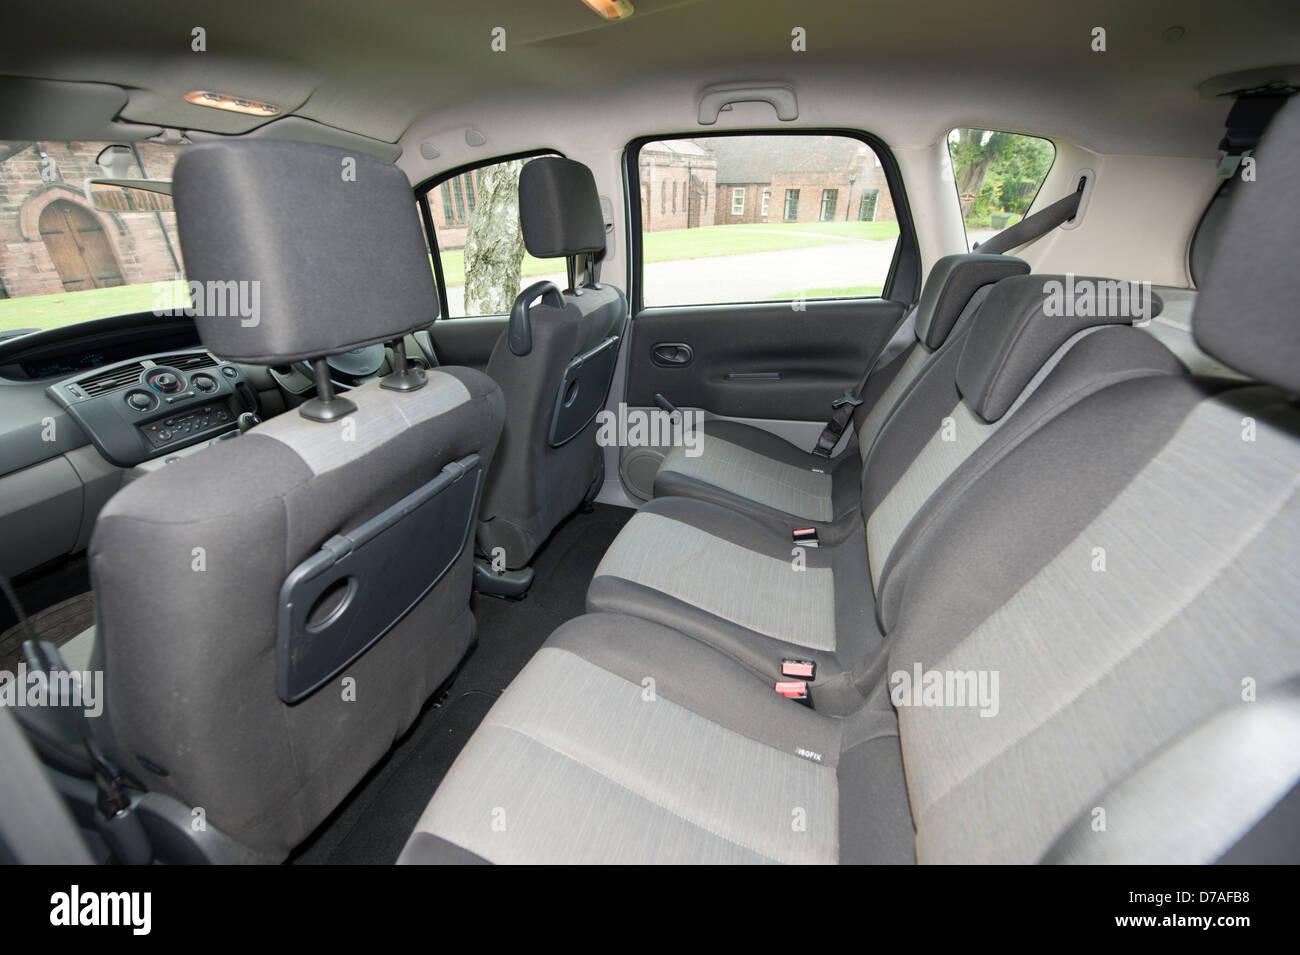 Inside interior of renault scenic car stock photo royalty for Interior renault scenic